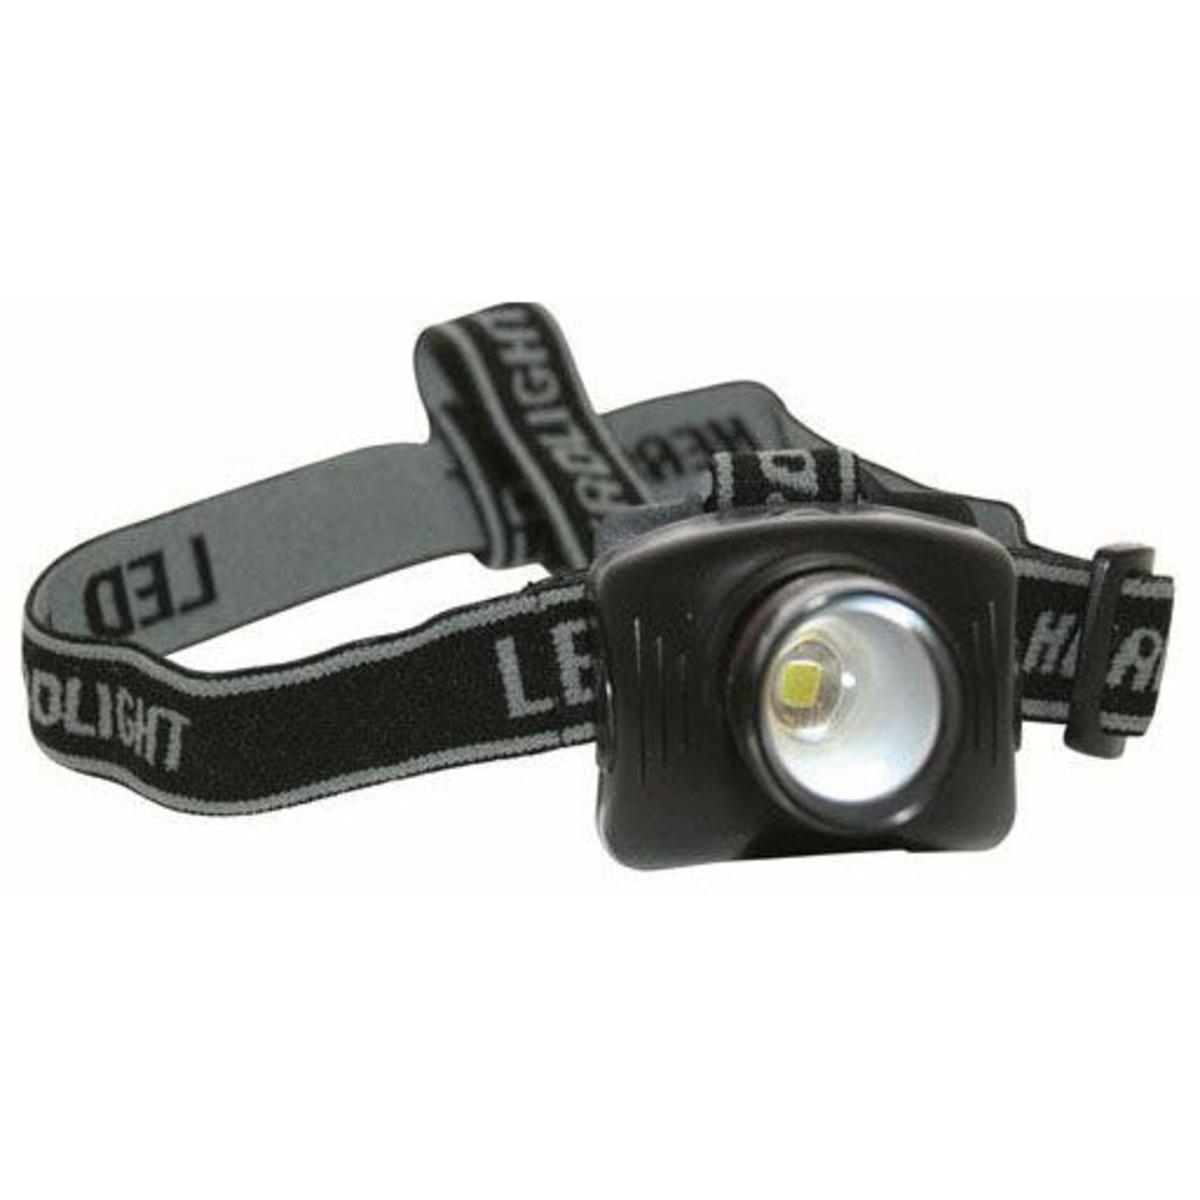 Zebco Power Focus Headlamp - 1 Led